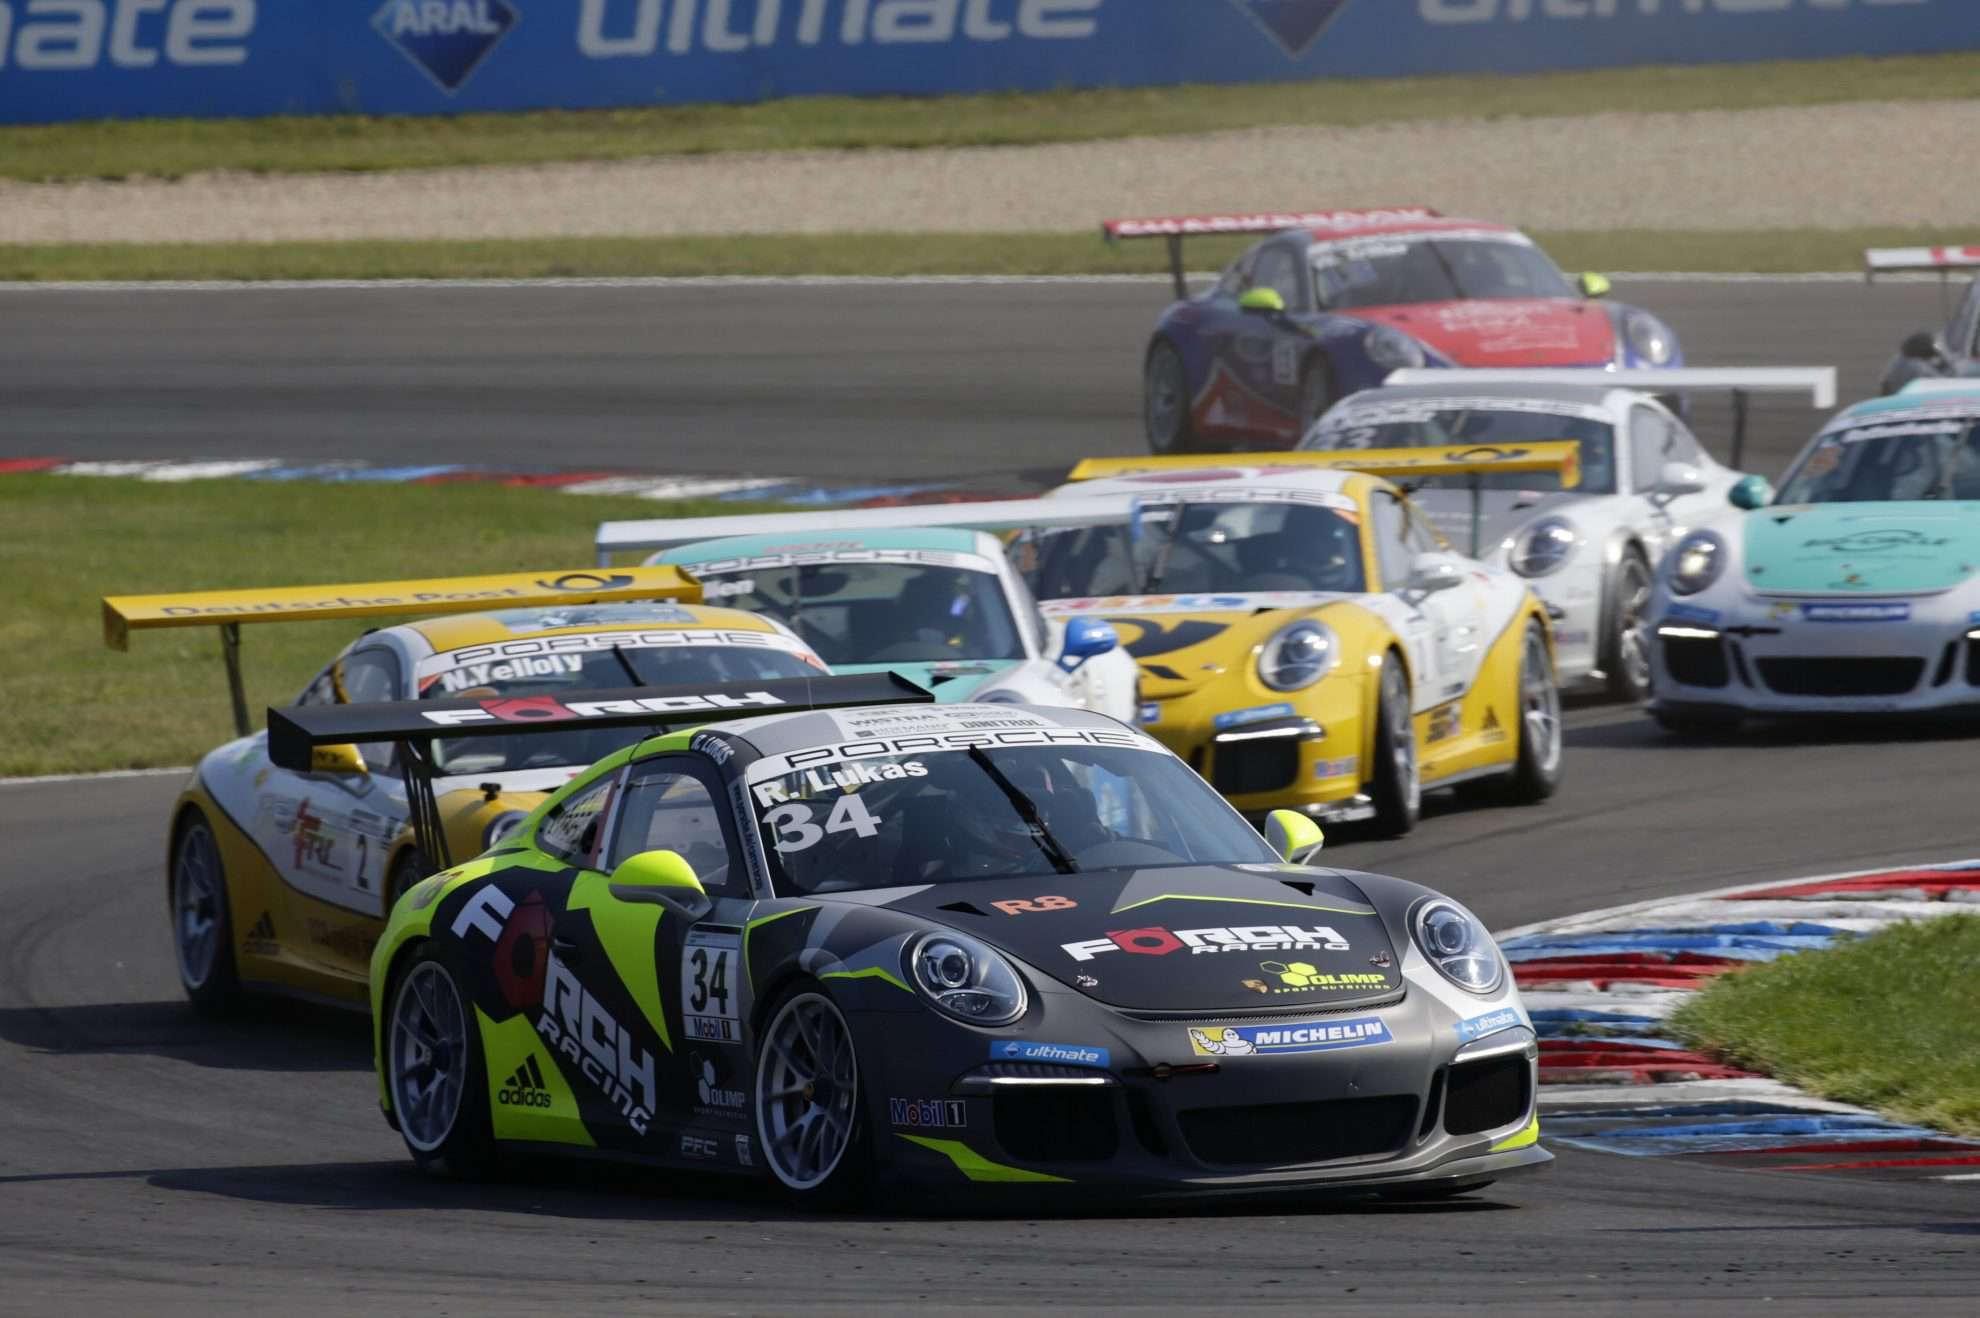 Robert Lukas (PL) Porsche Carrera Cup Deutschland - 04 Lausitzring 2016